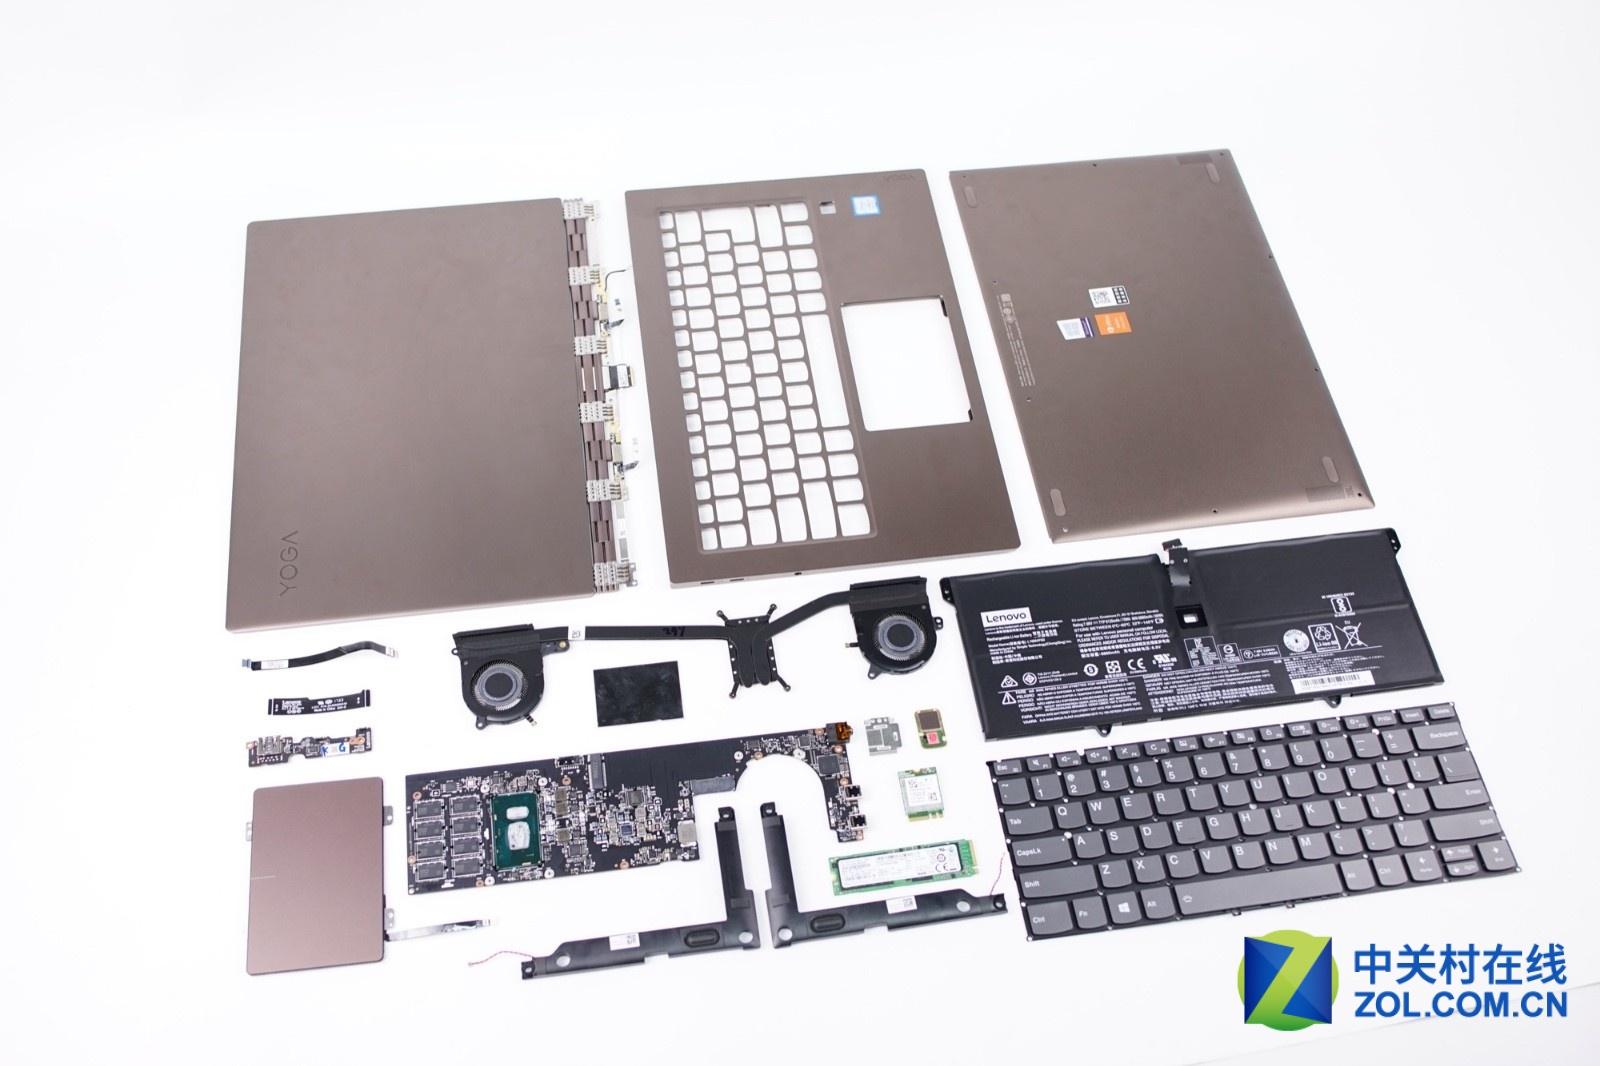 Lenovo Yoga 920 Disassembly (SSD, RAM Upgrade Options